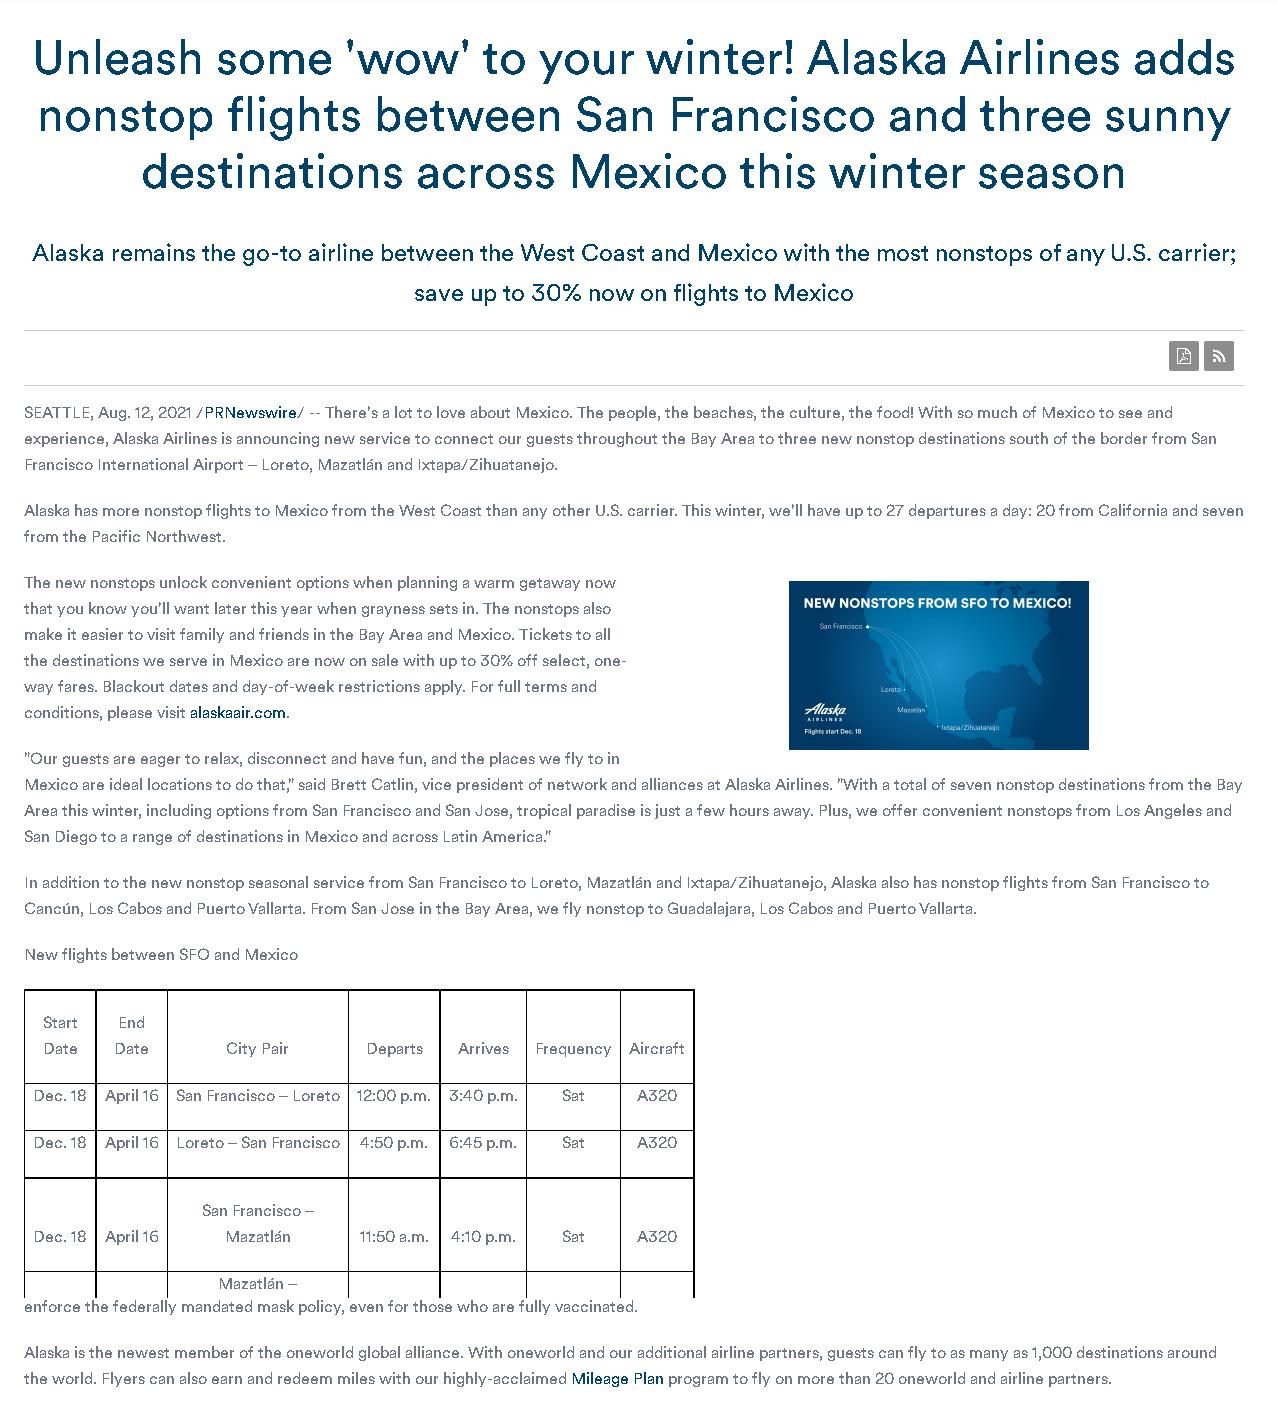 Additional Direct Flight from San Francisco to Mazatlán